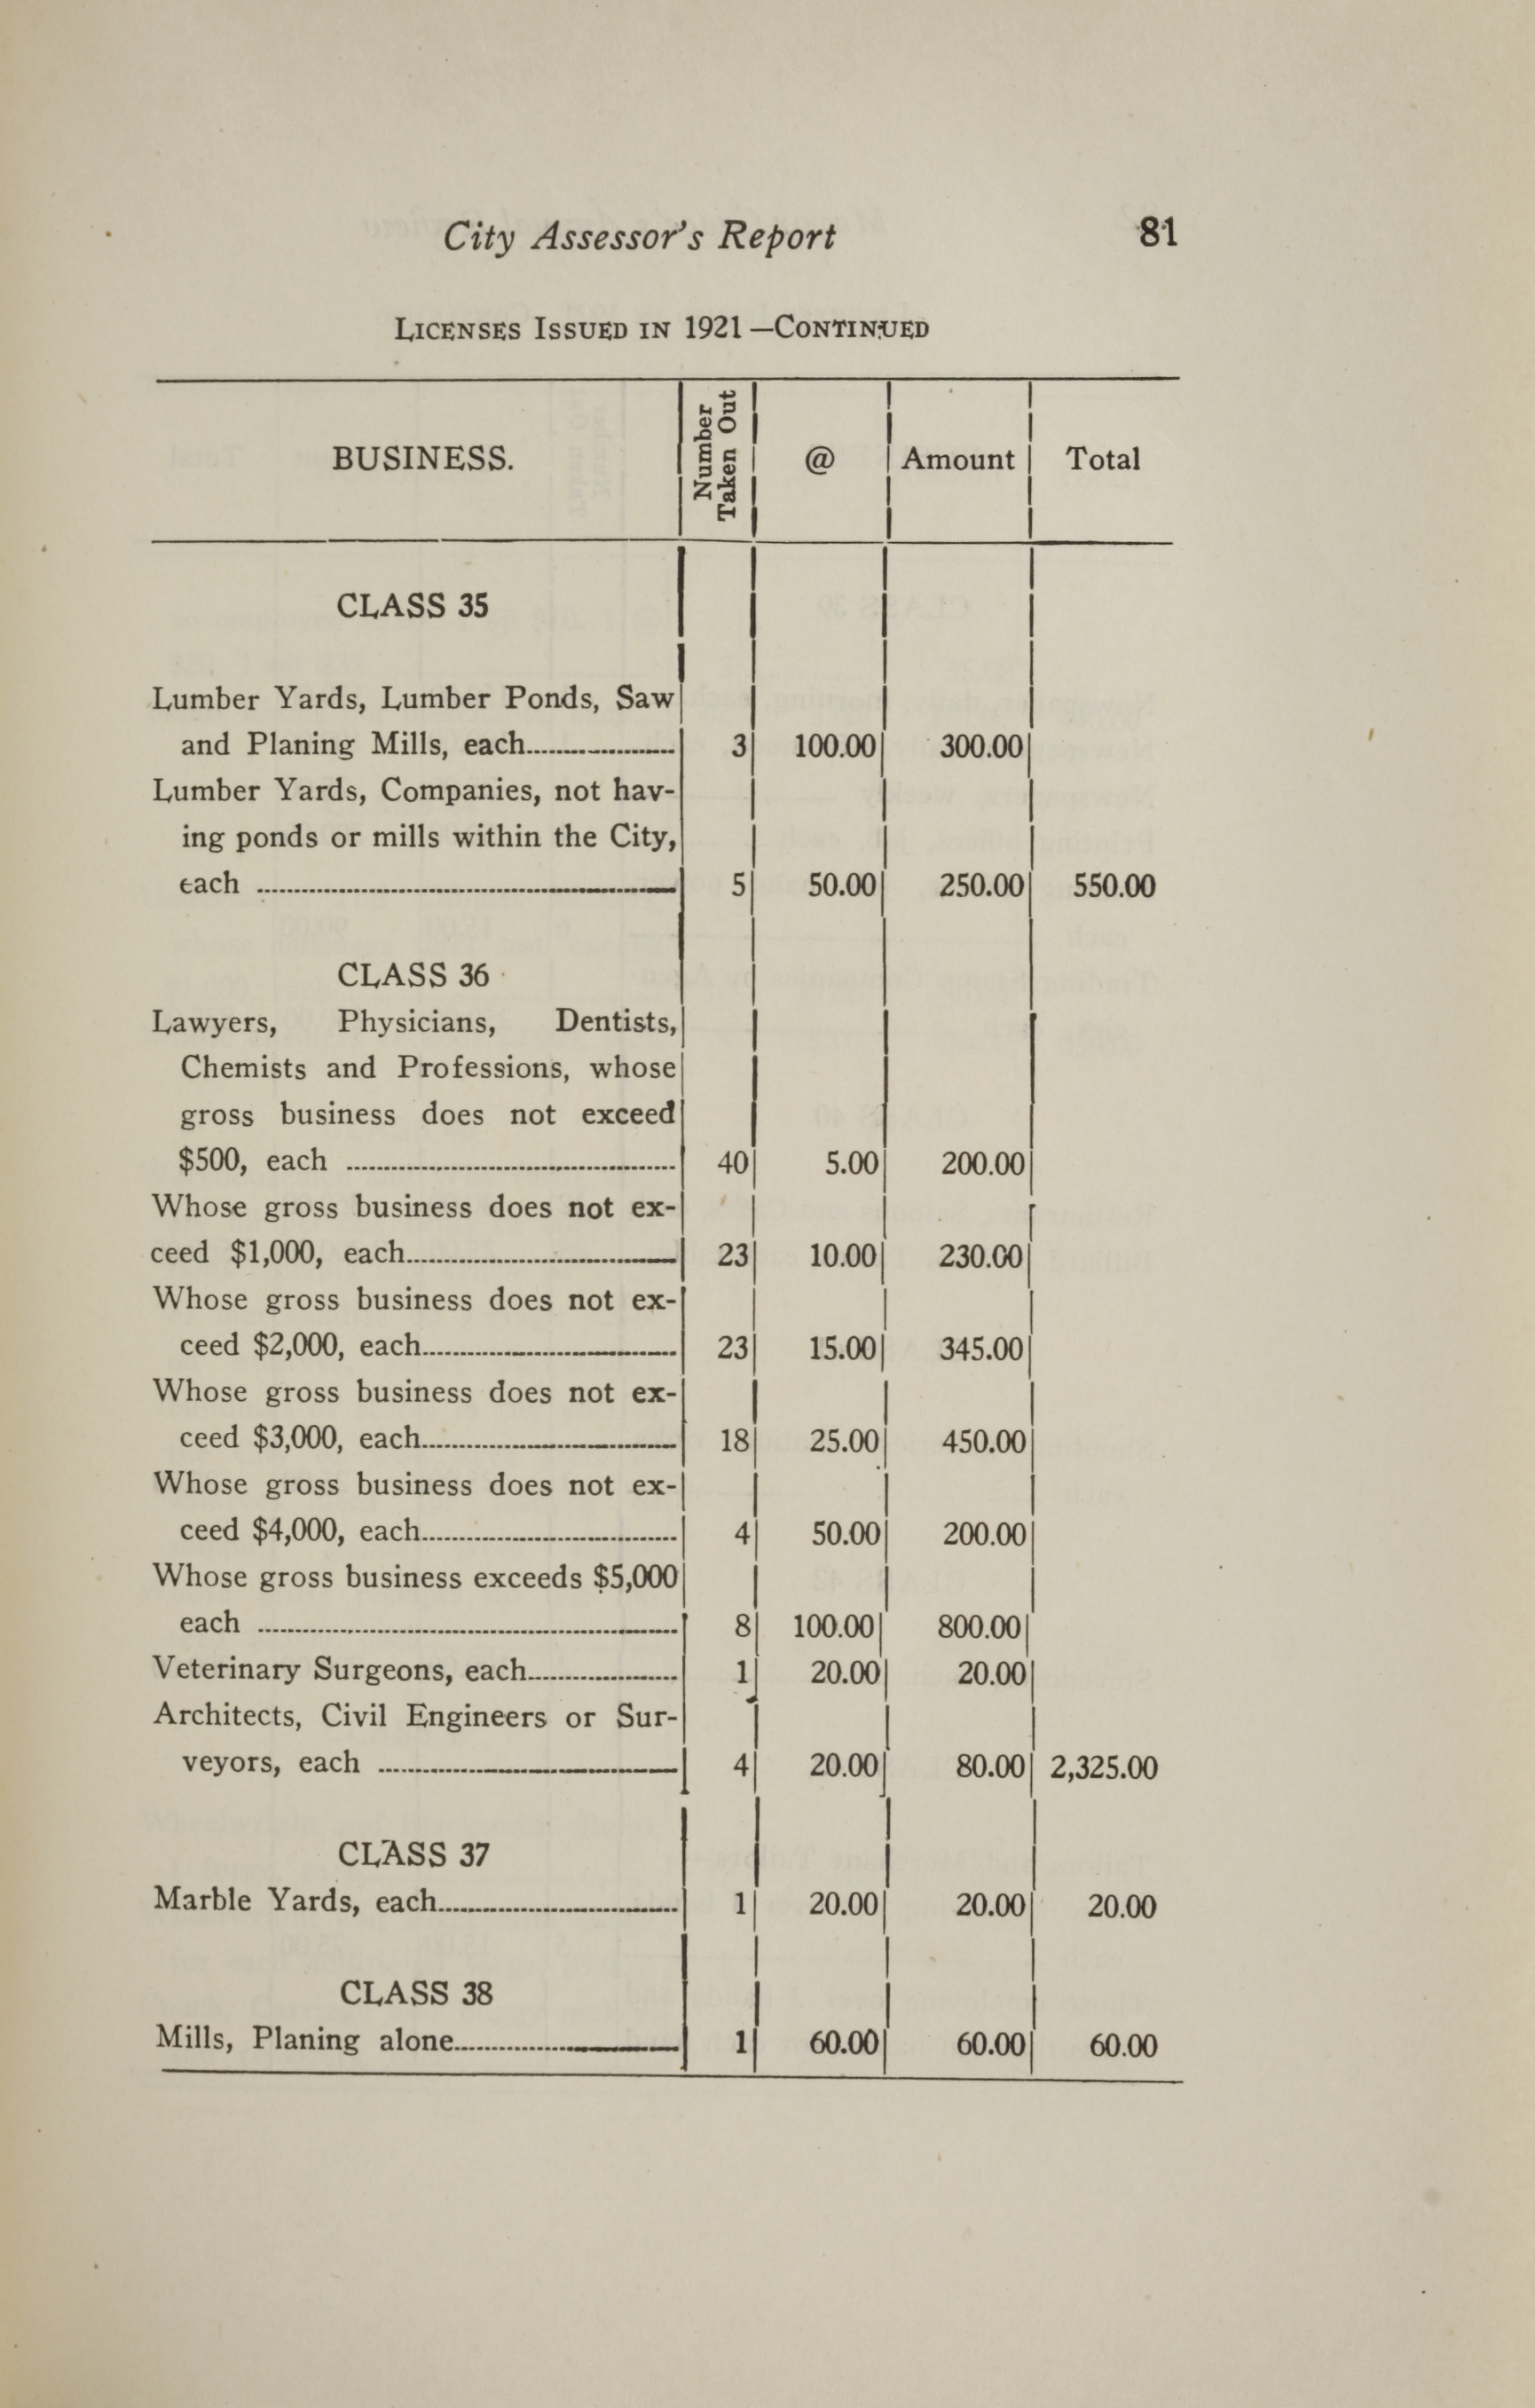 Charleston Yearbook, 1921, page 81